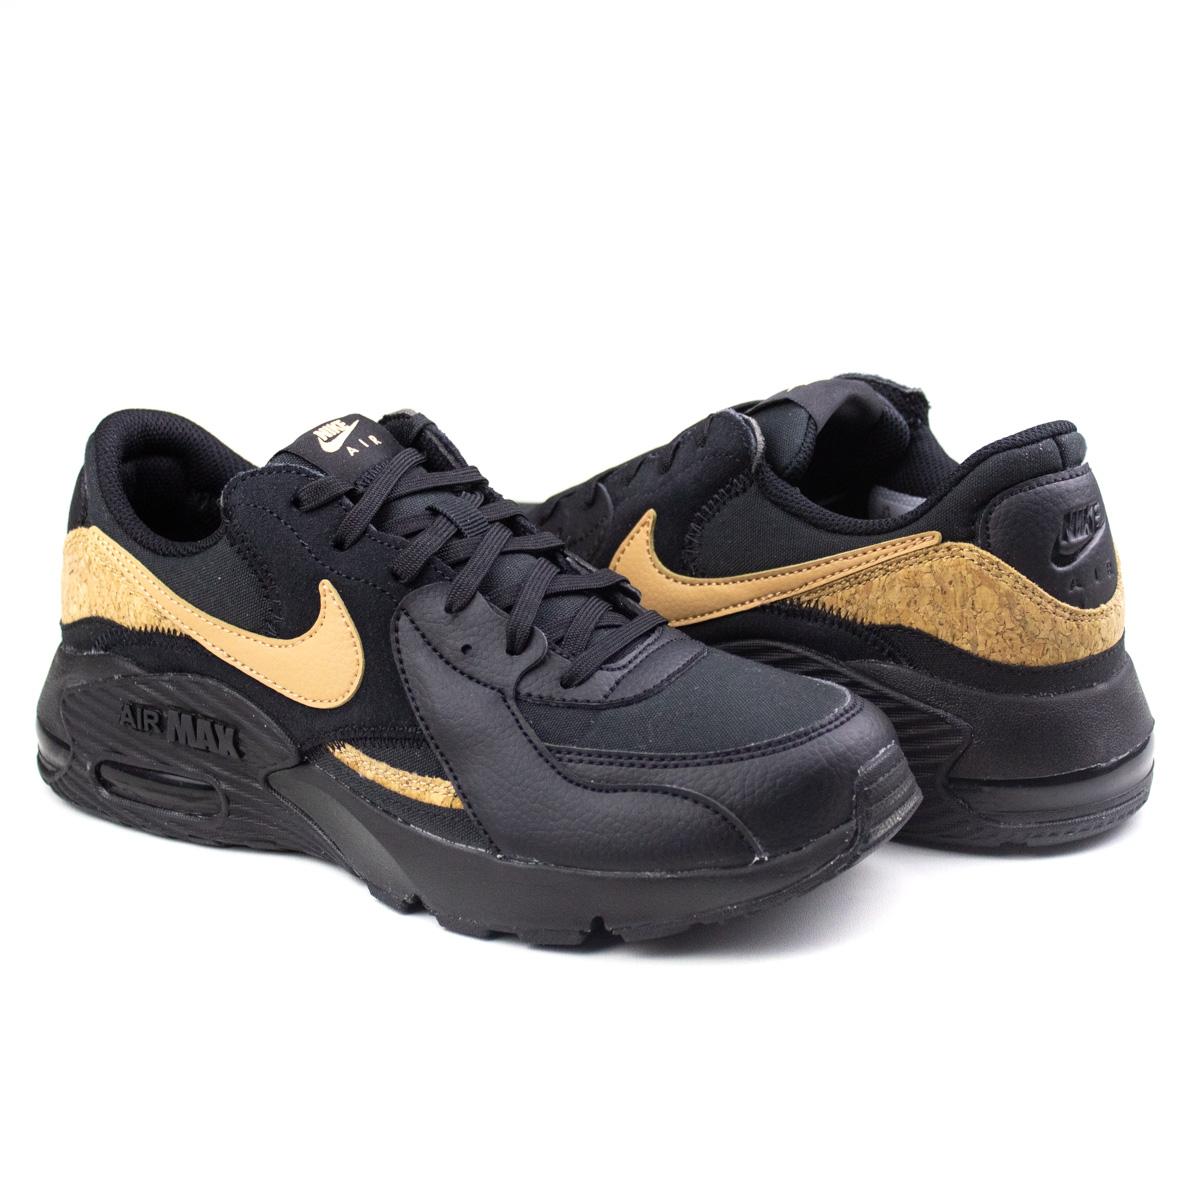 Tênis Masculino Nike Air Max Excee MTZ Nike - Black/praline-multi-color